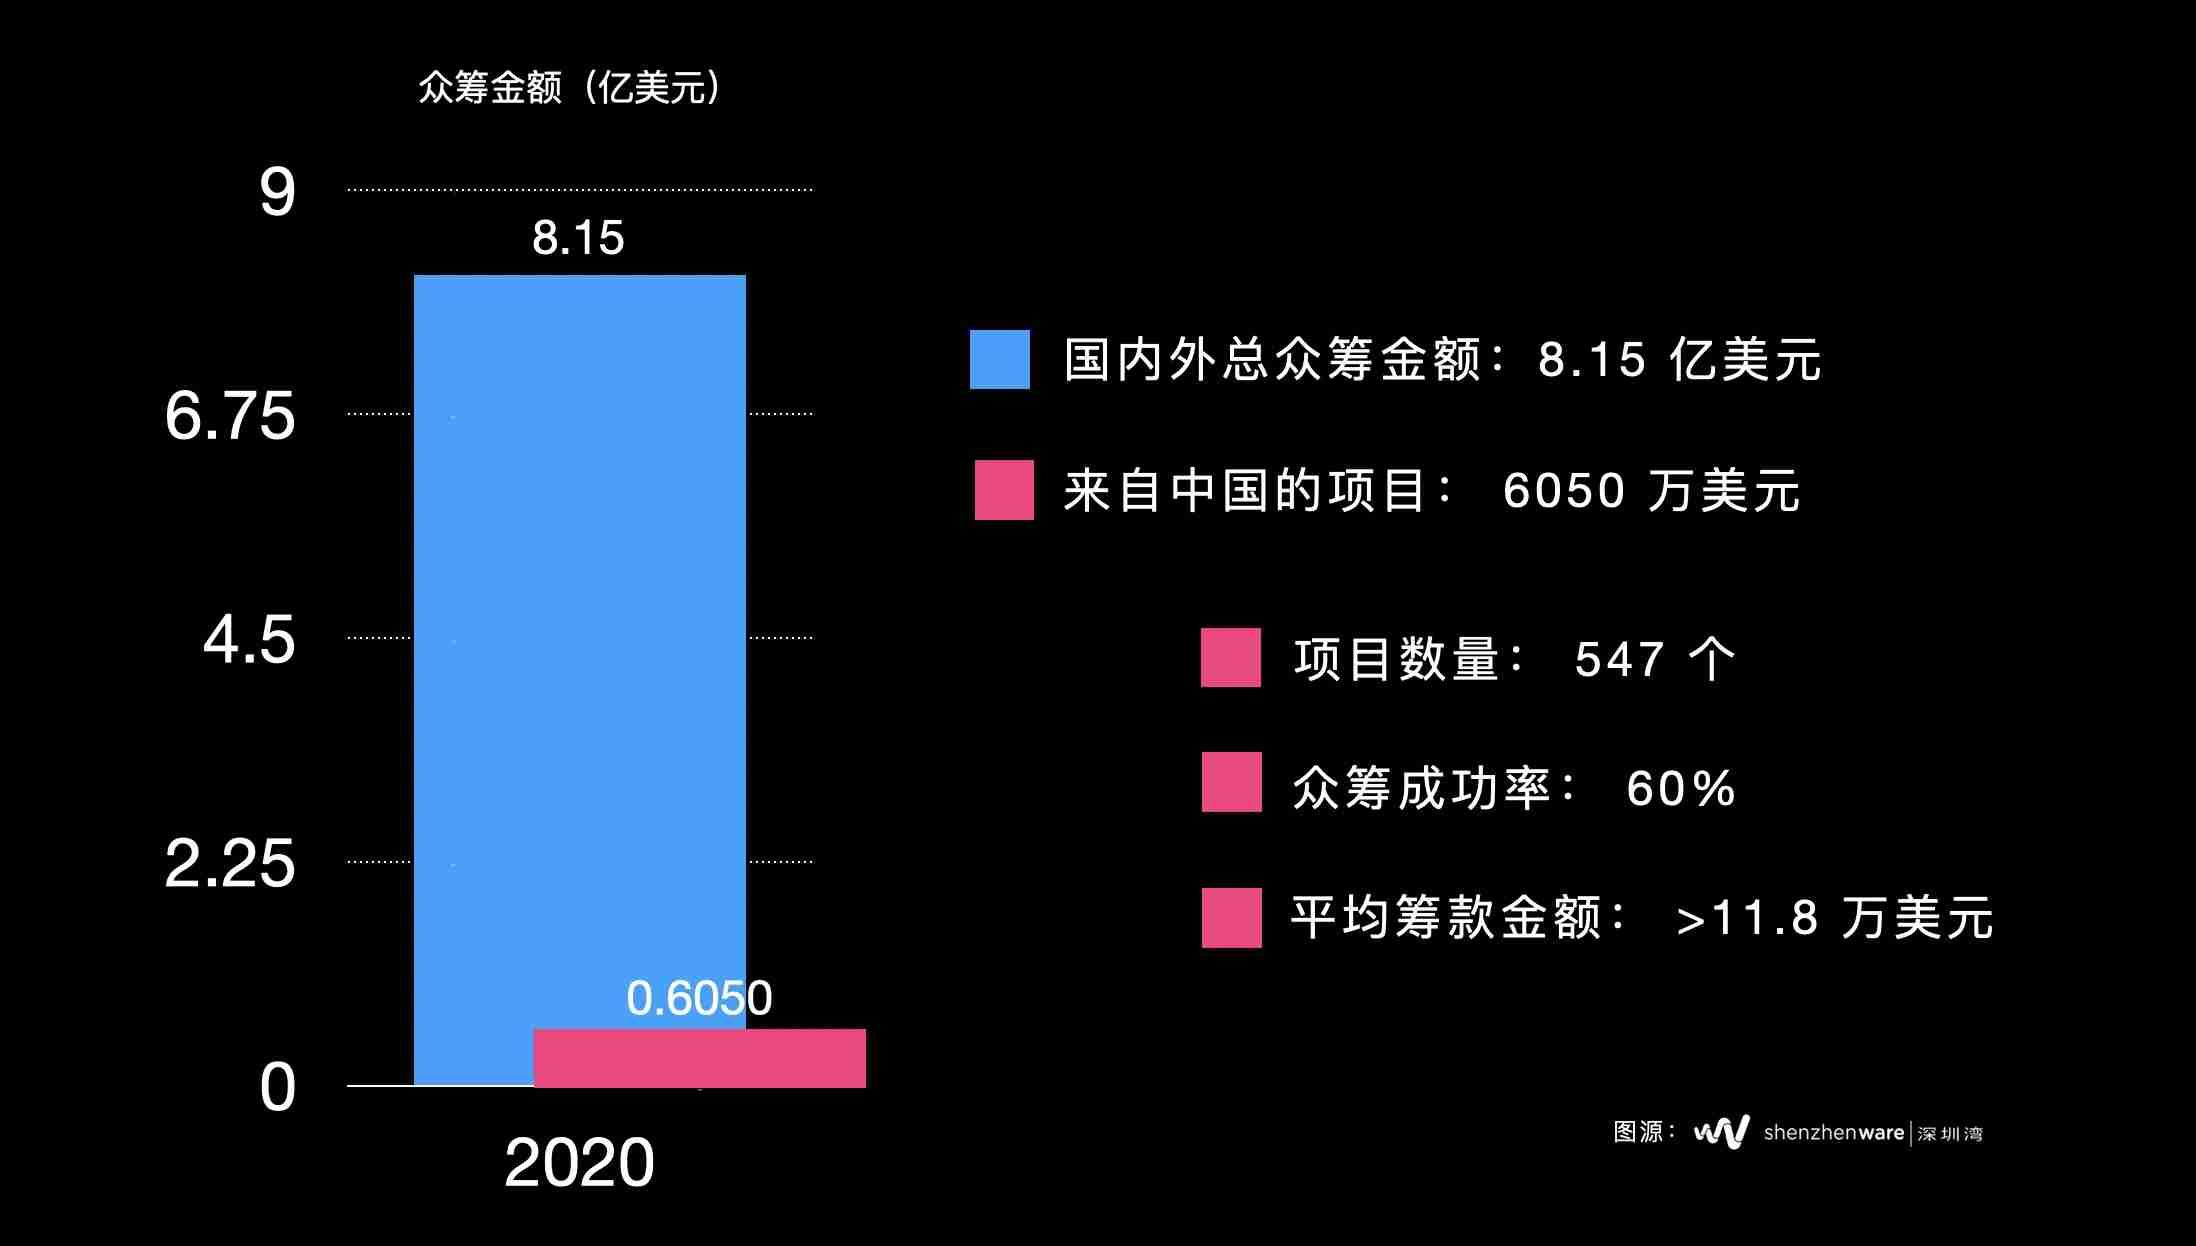 2020_KS_%E5%9B%BD%E5%86%85%E4%BC%97%E7%AD%B9%E6%A6%82%E8%A7%88